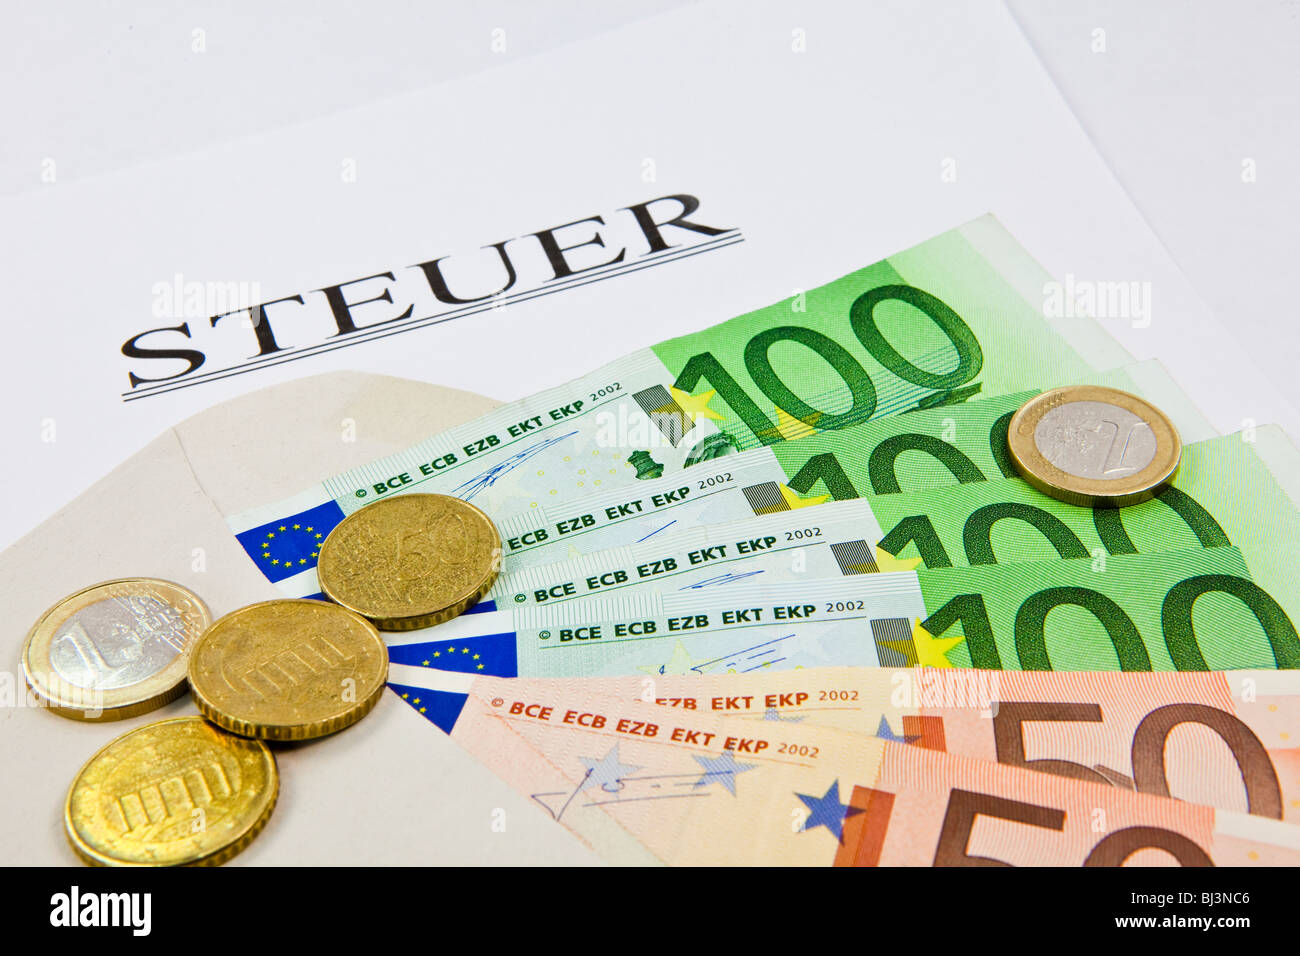 Envelope with euros, tax money - Stock Image